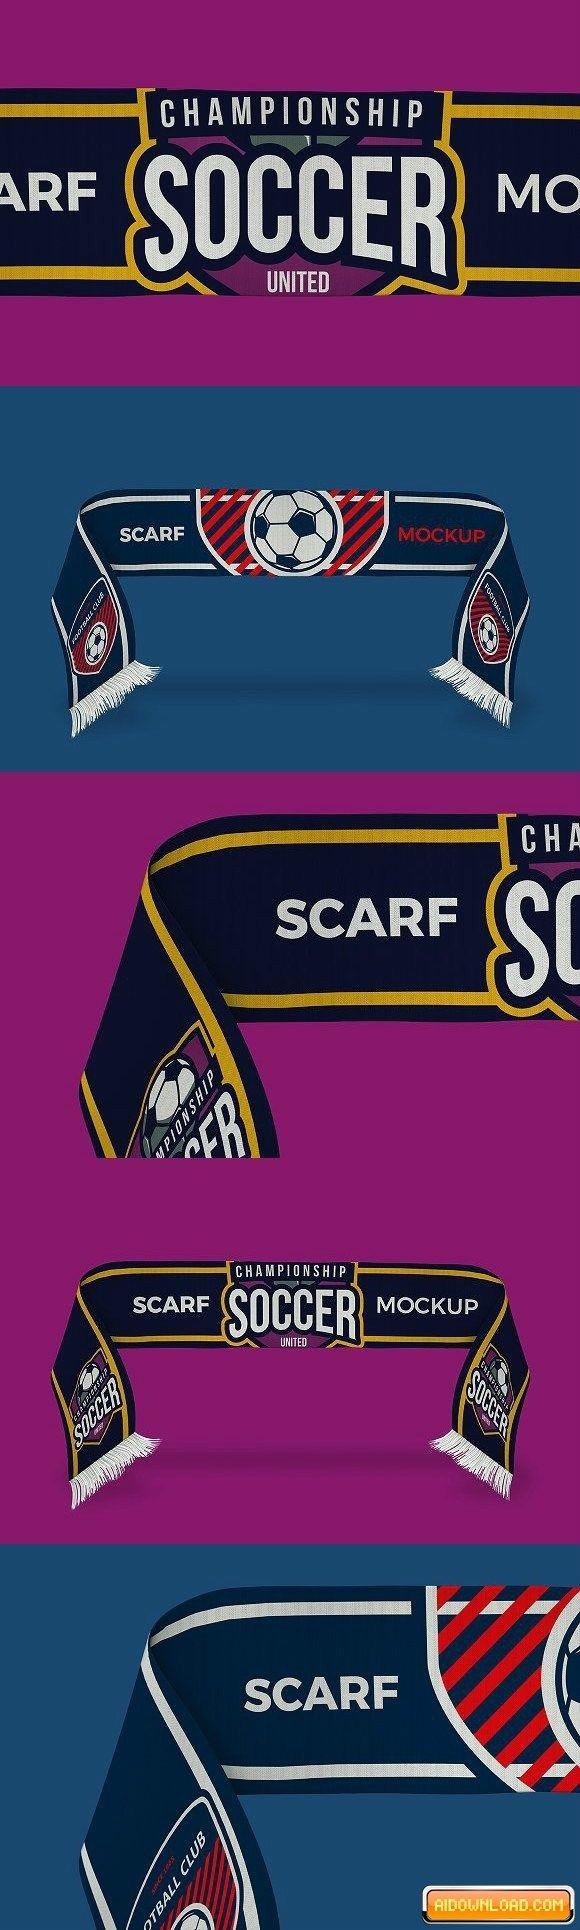 Download Sport Scarf Mockup Free Download Mockup Free Download Mockup Free Mockup